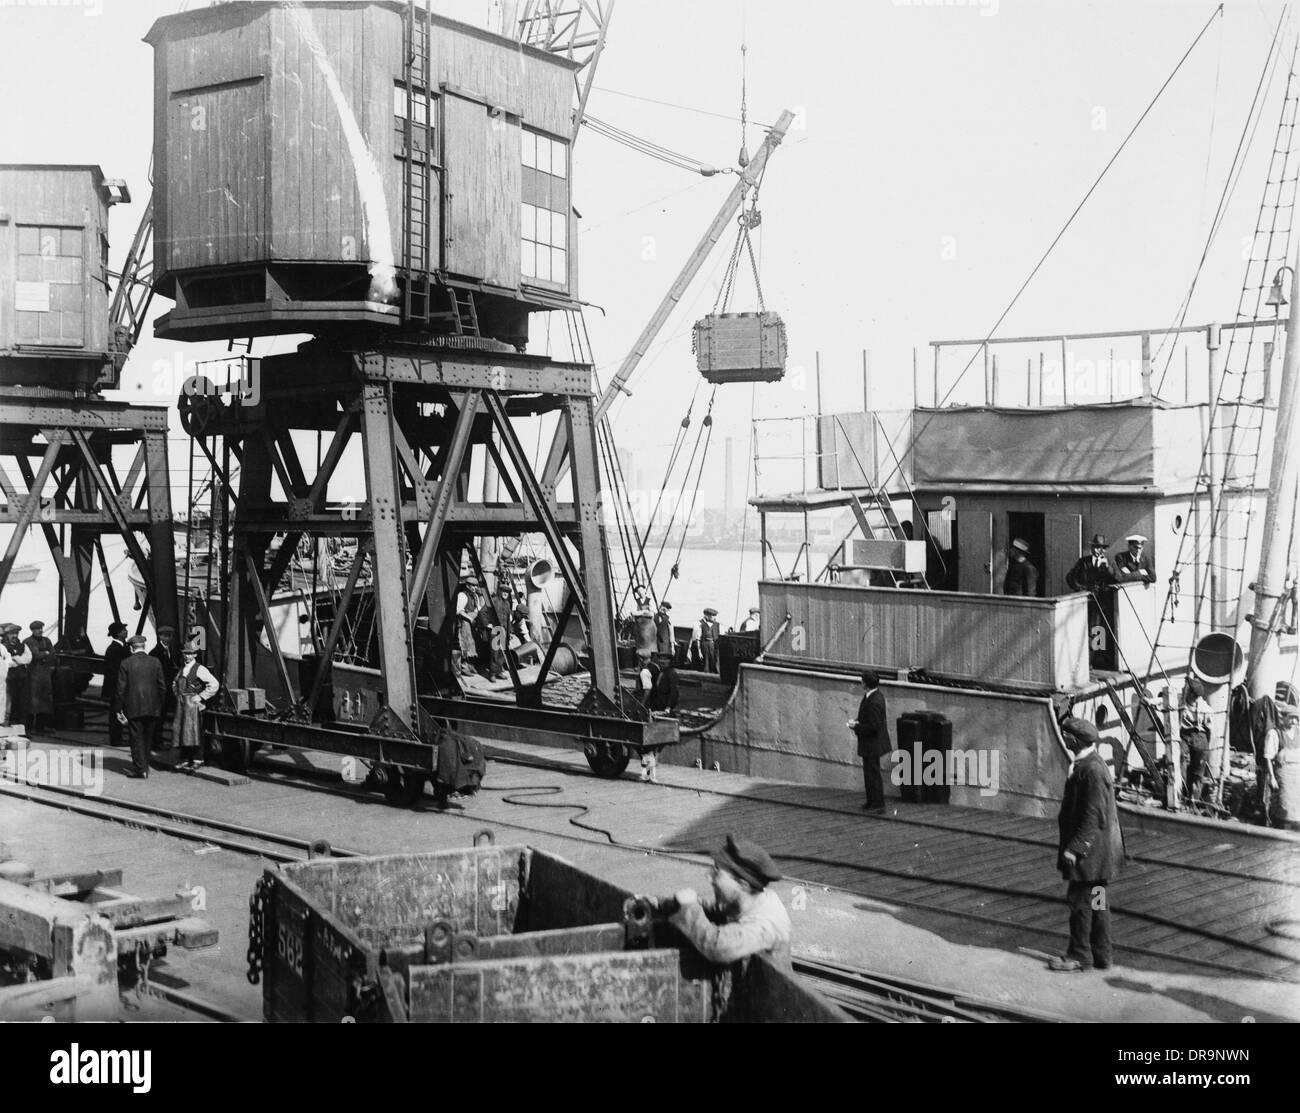 Loading supply ship, World War I - Stock Image